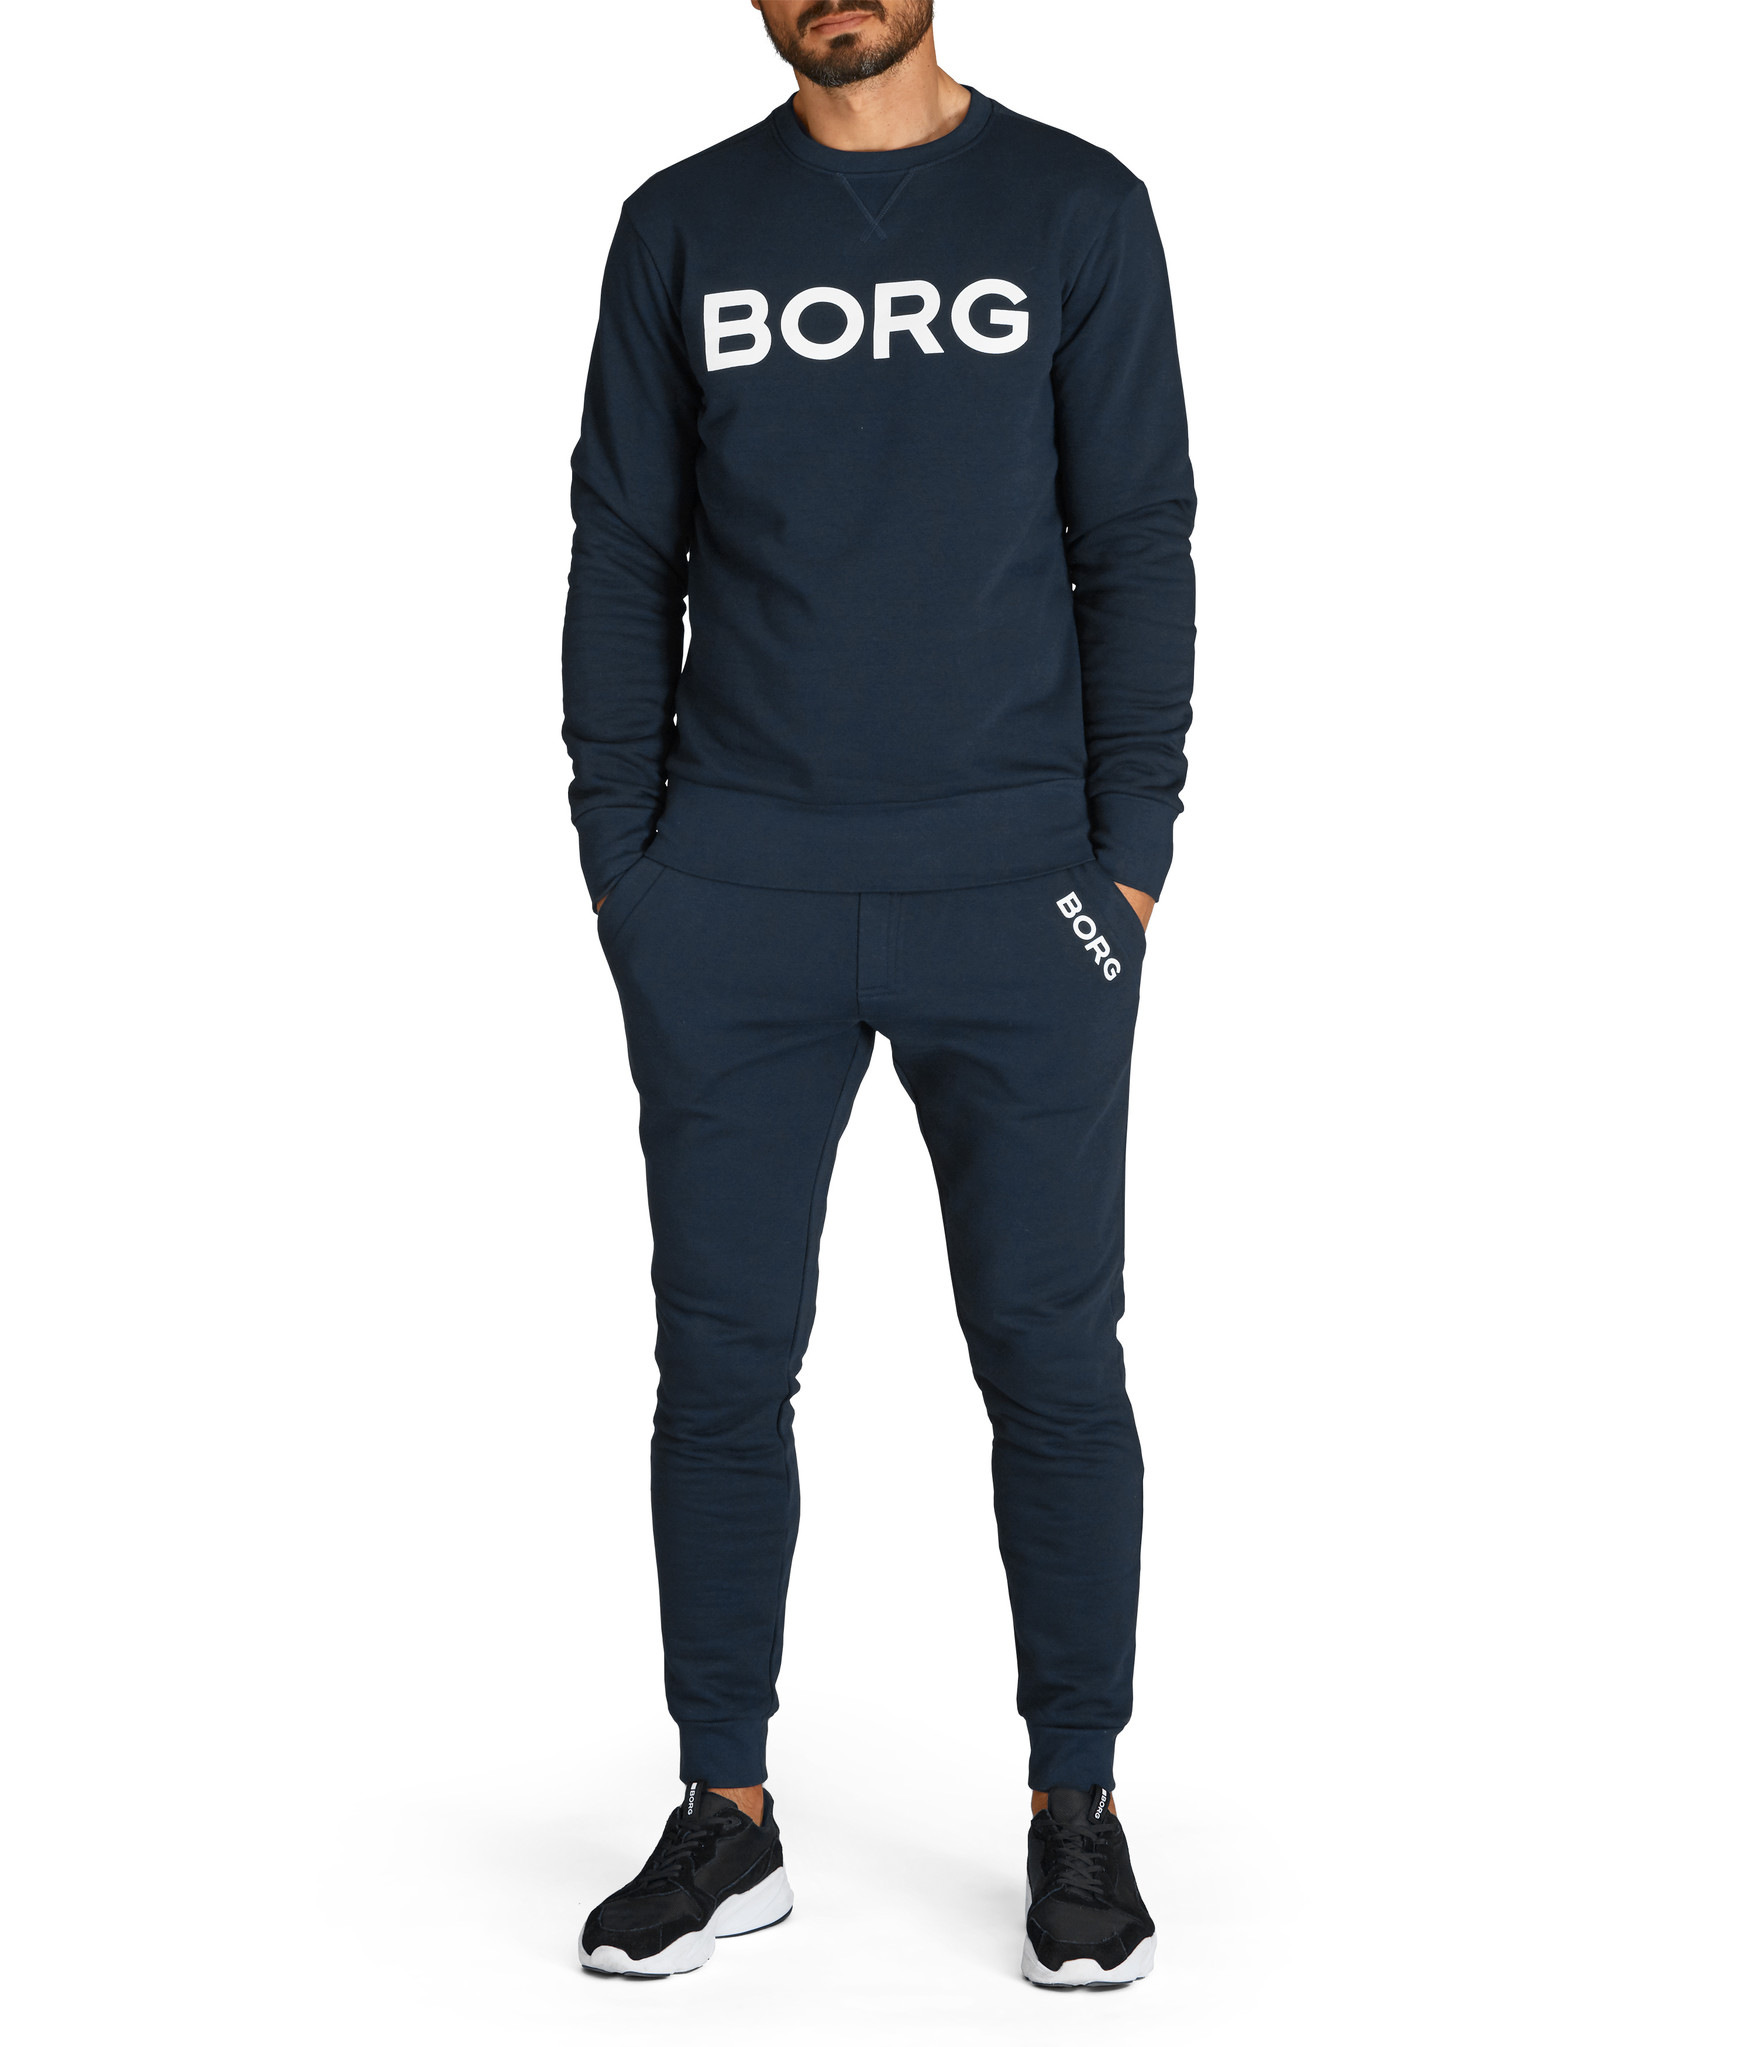 Bjorn Borg Jogging Bjorn Borg 9999-1620-72731